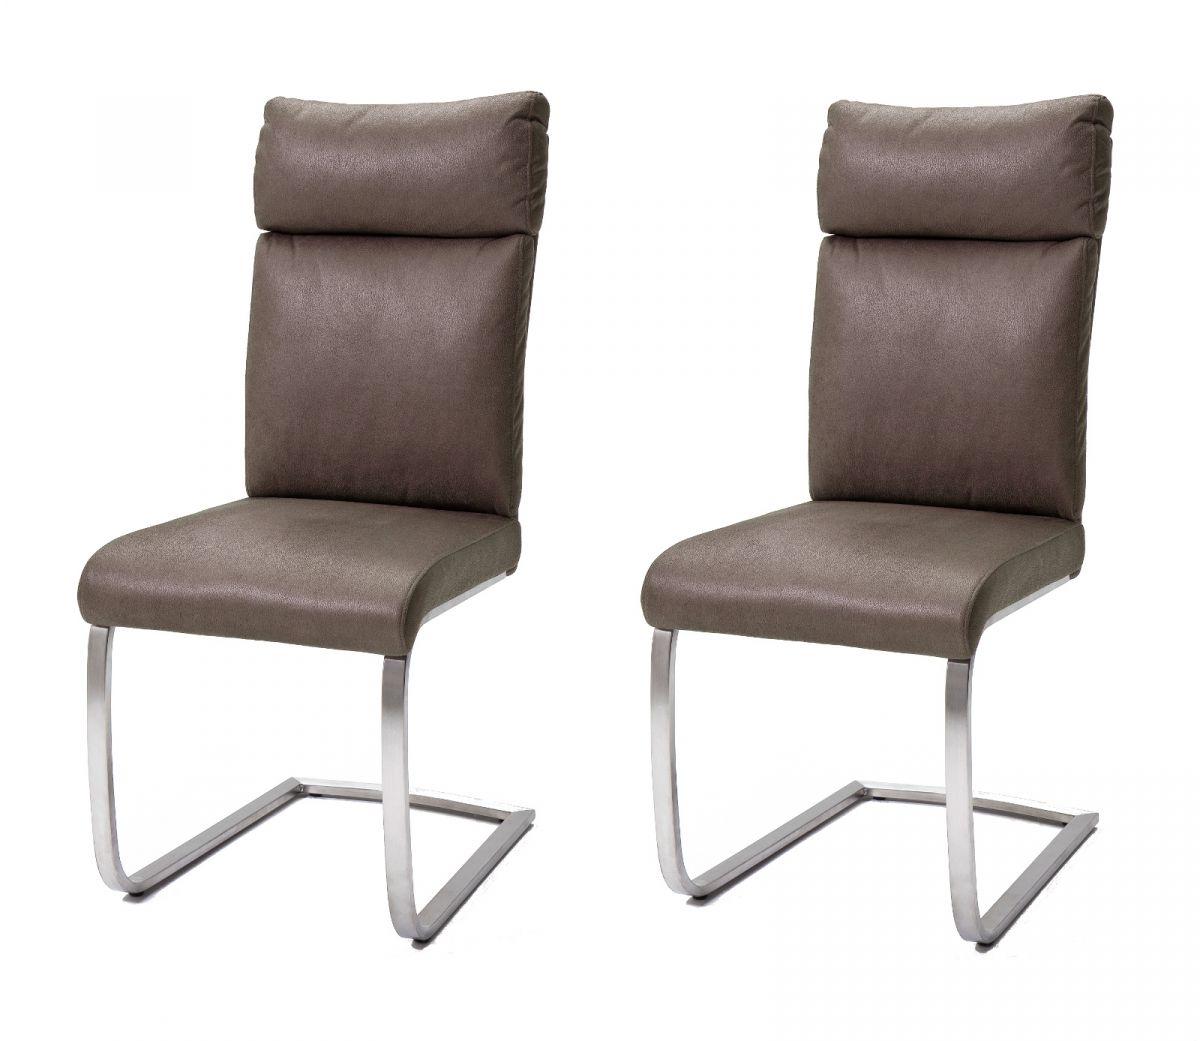 2 x Stuhl Rabea Braun Schwinger